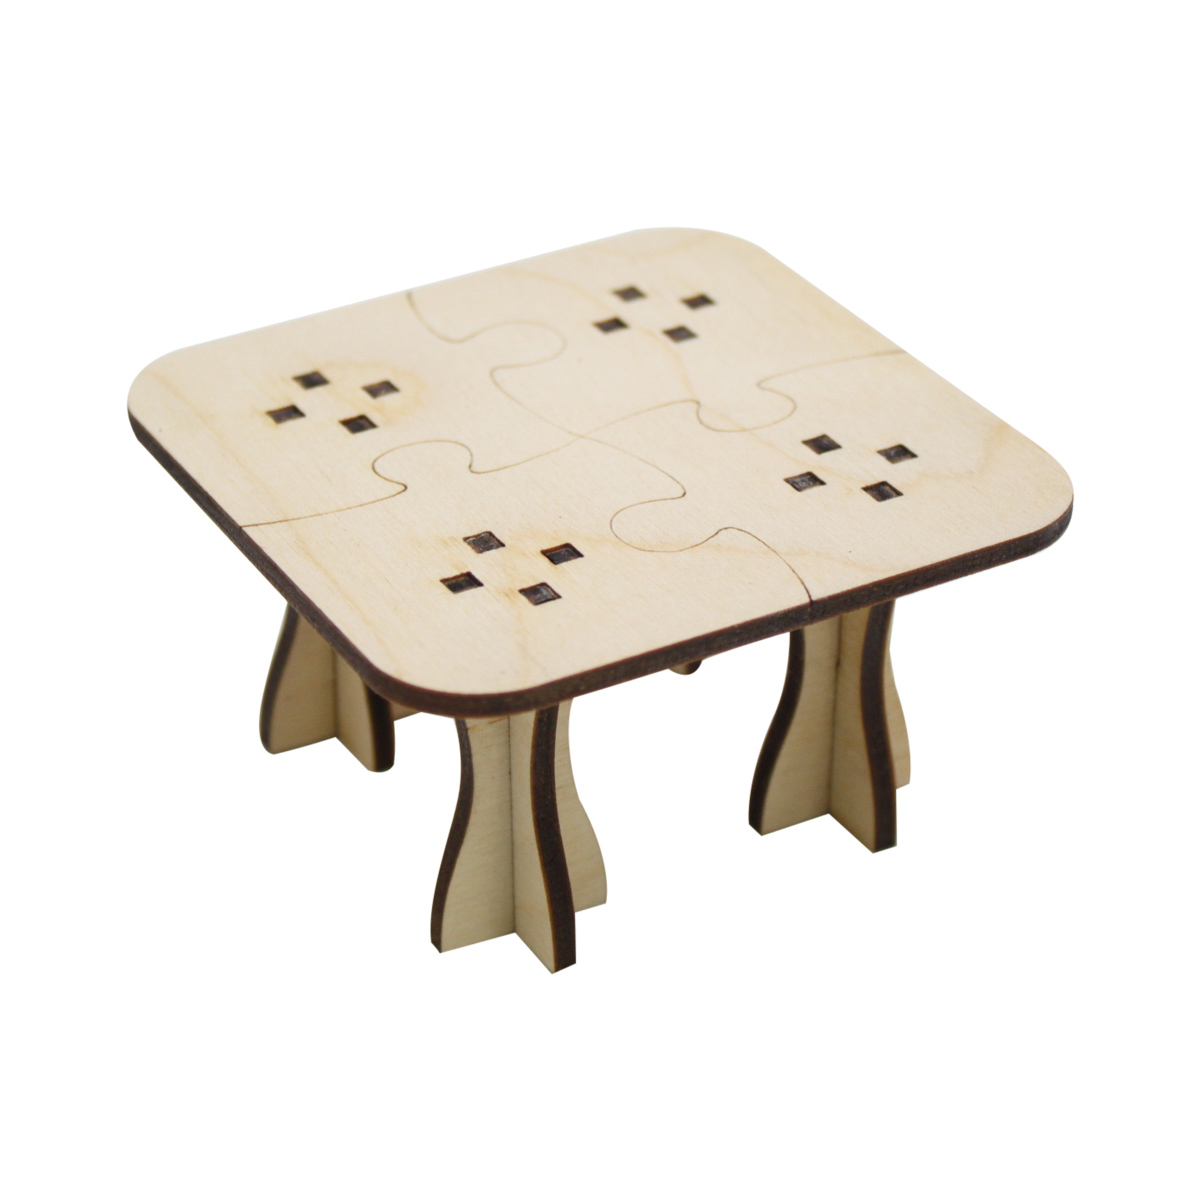 L-495 Деревянная заготовка стол 'Пазлы', 8*5 см, 'Астра'